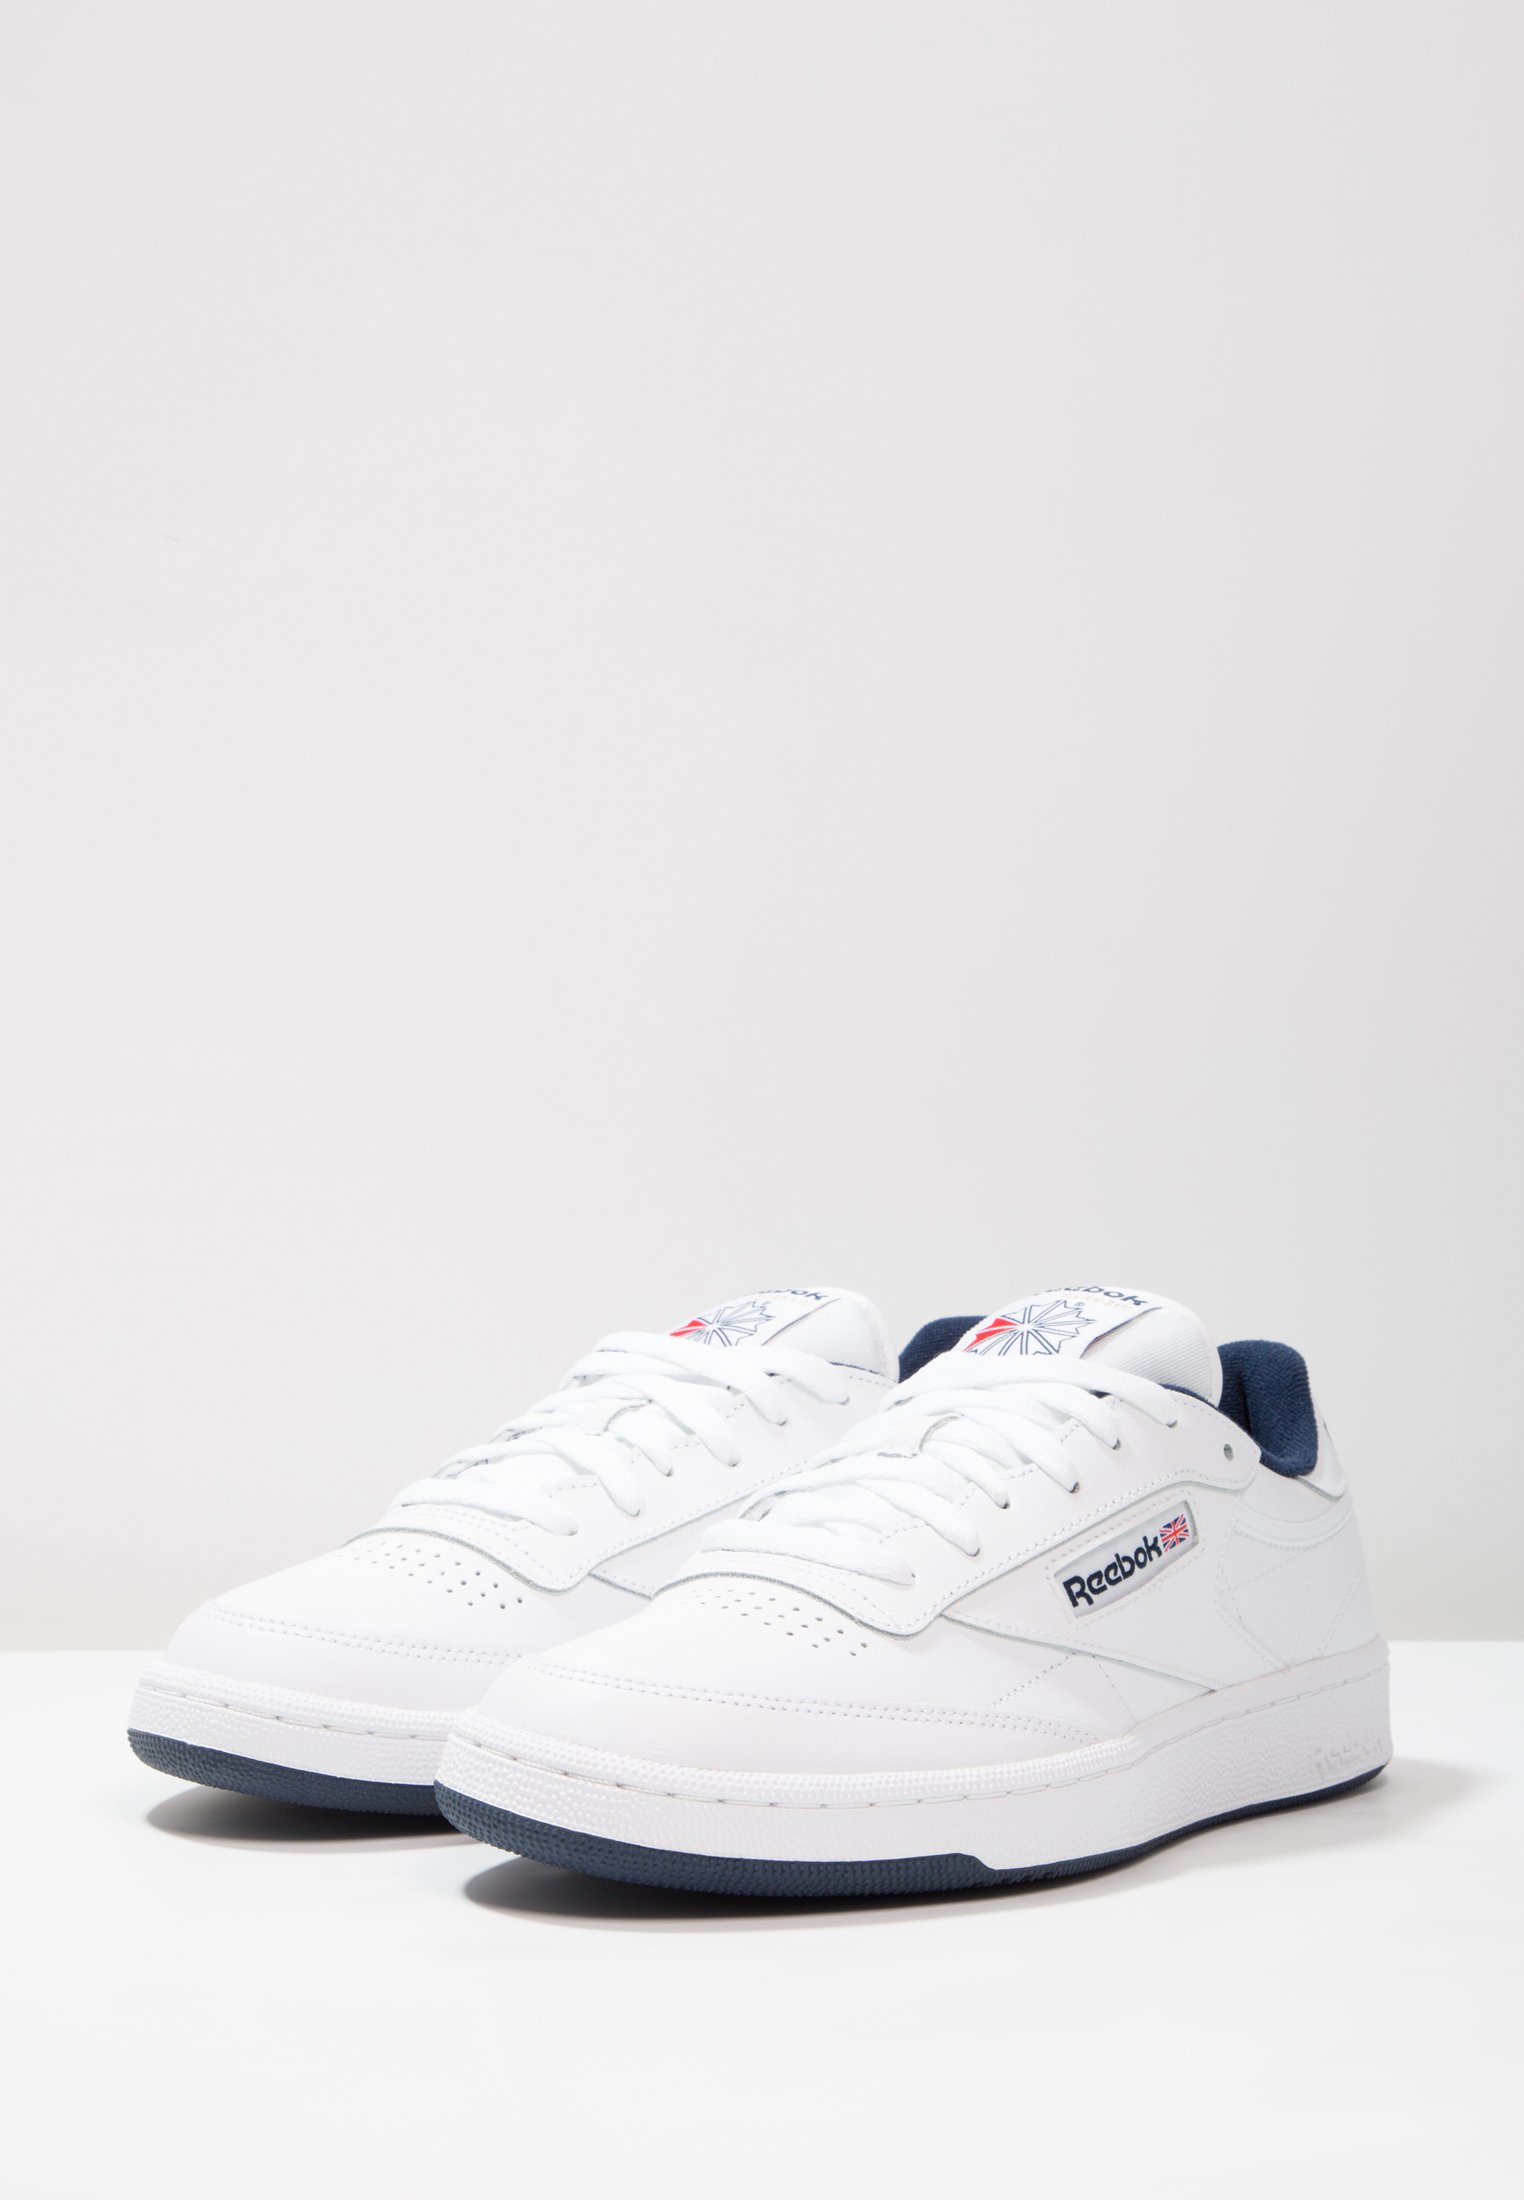 Gratis fragt Reebok Classic CLUB C 85 LEATHER UPPER SHOES  Sneakers  white/navy VHfsj